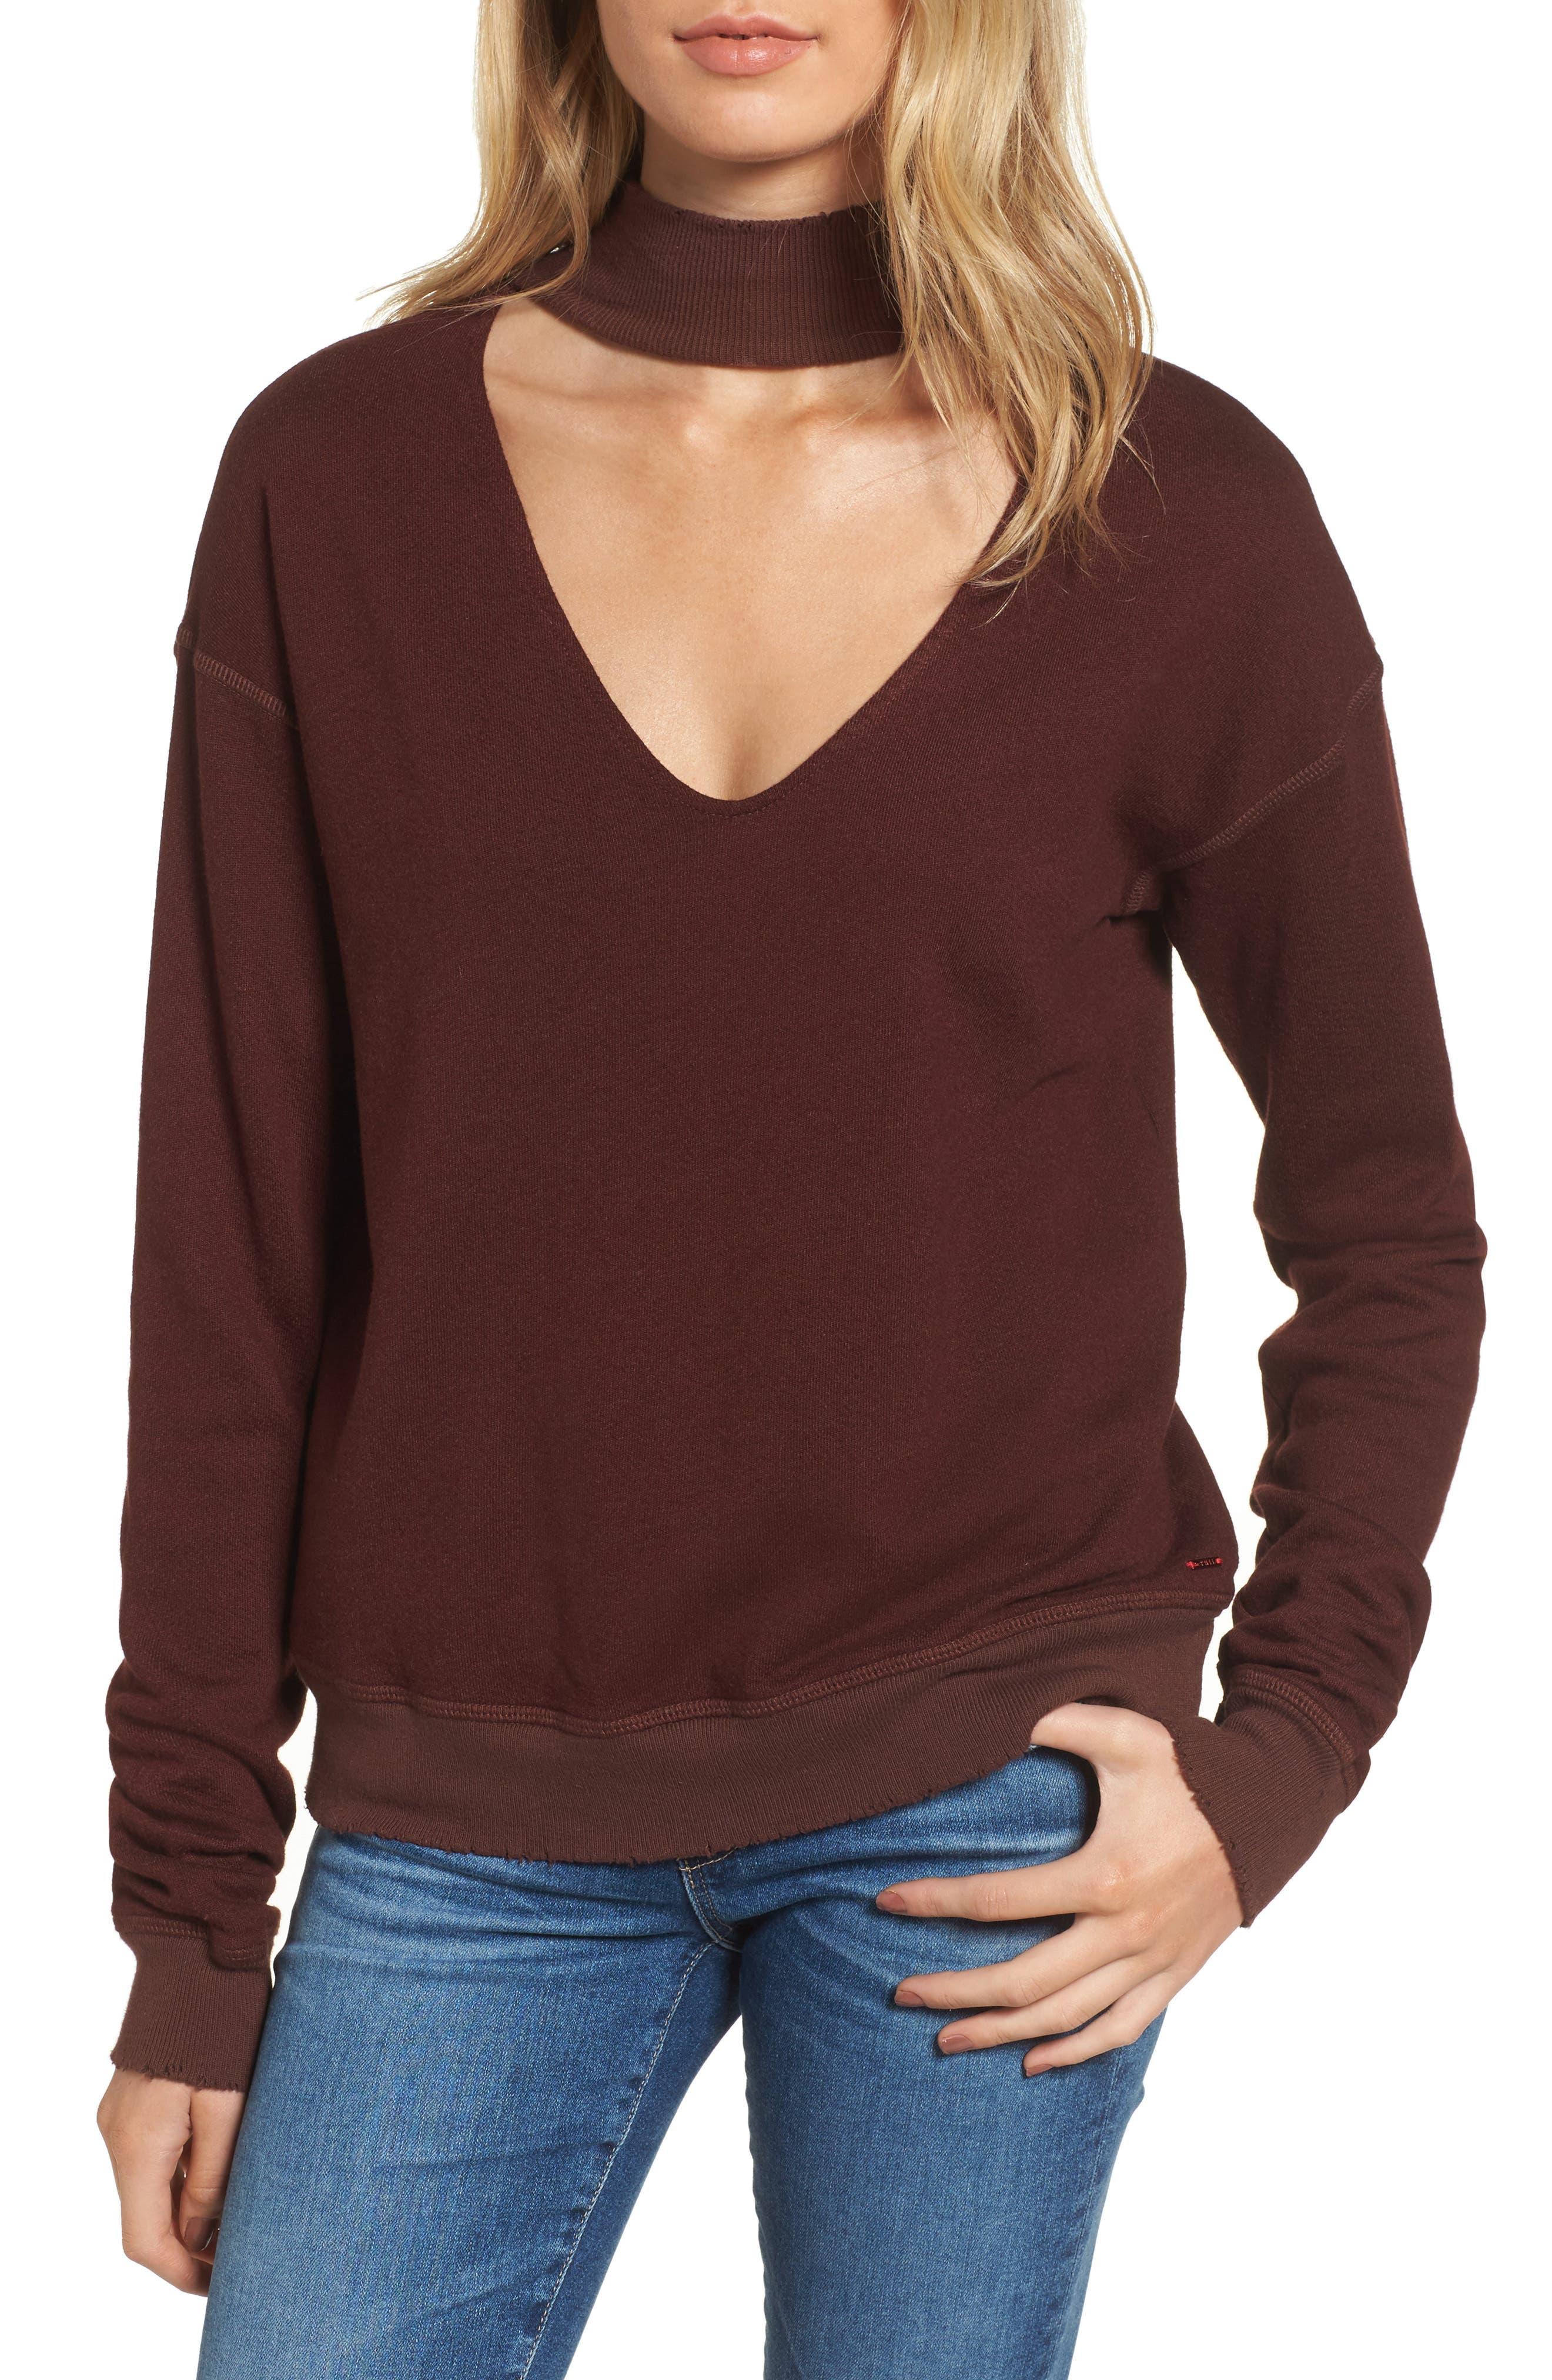 Bae Sweatshirt,                         Main,                         color, 930